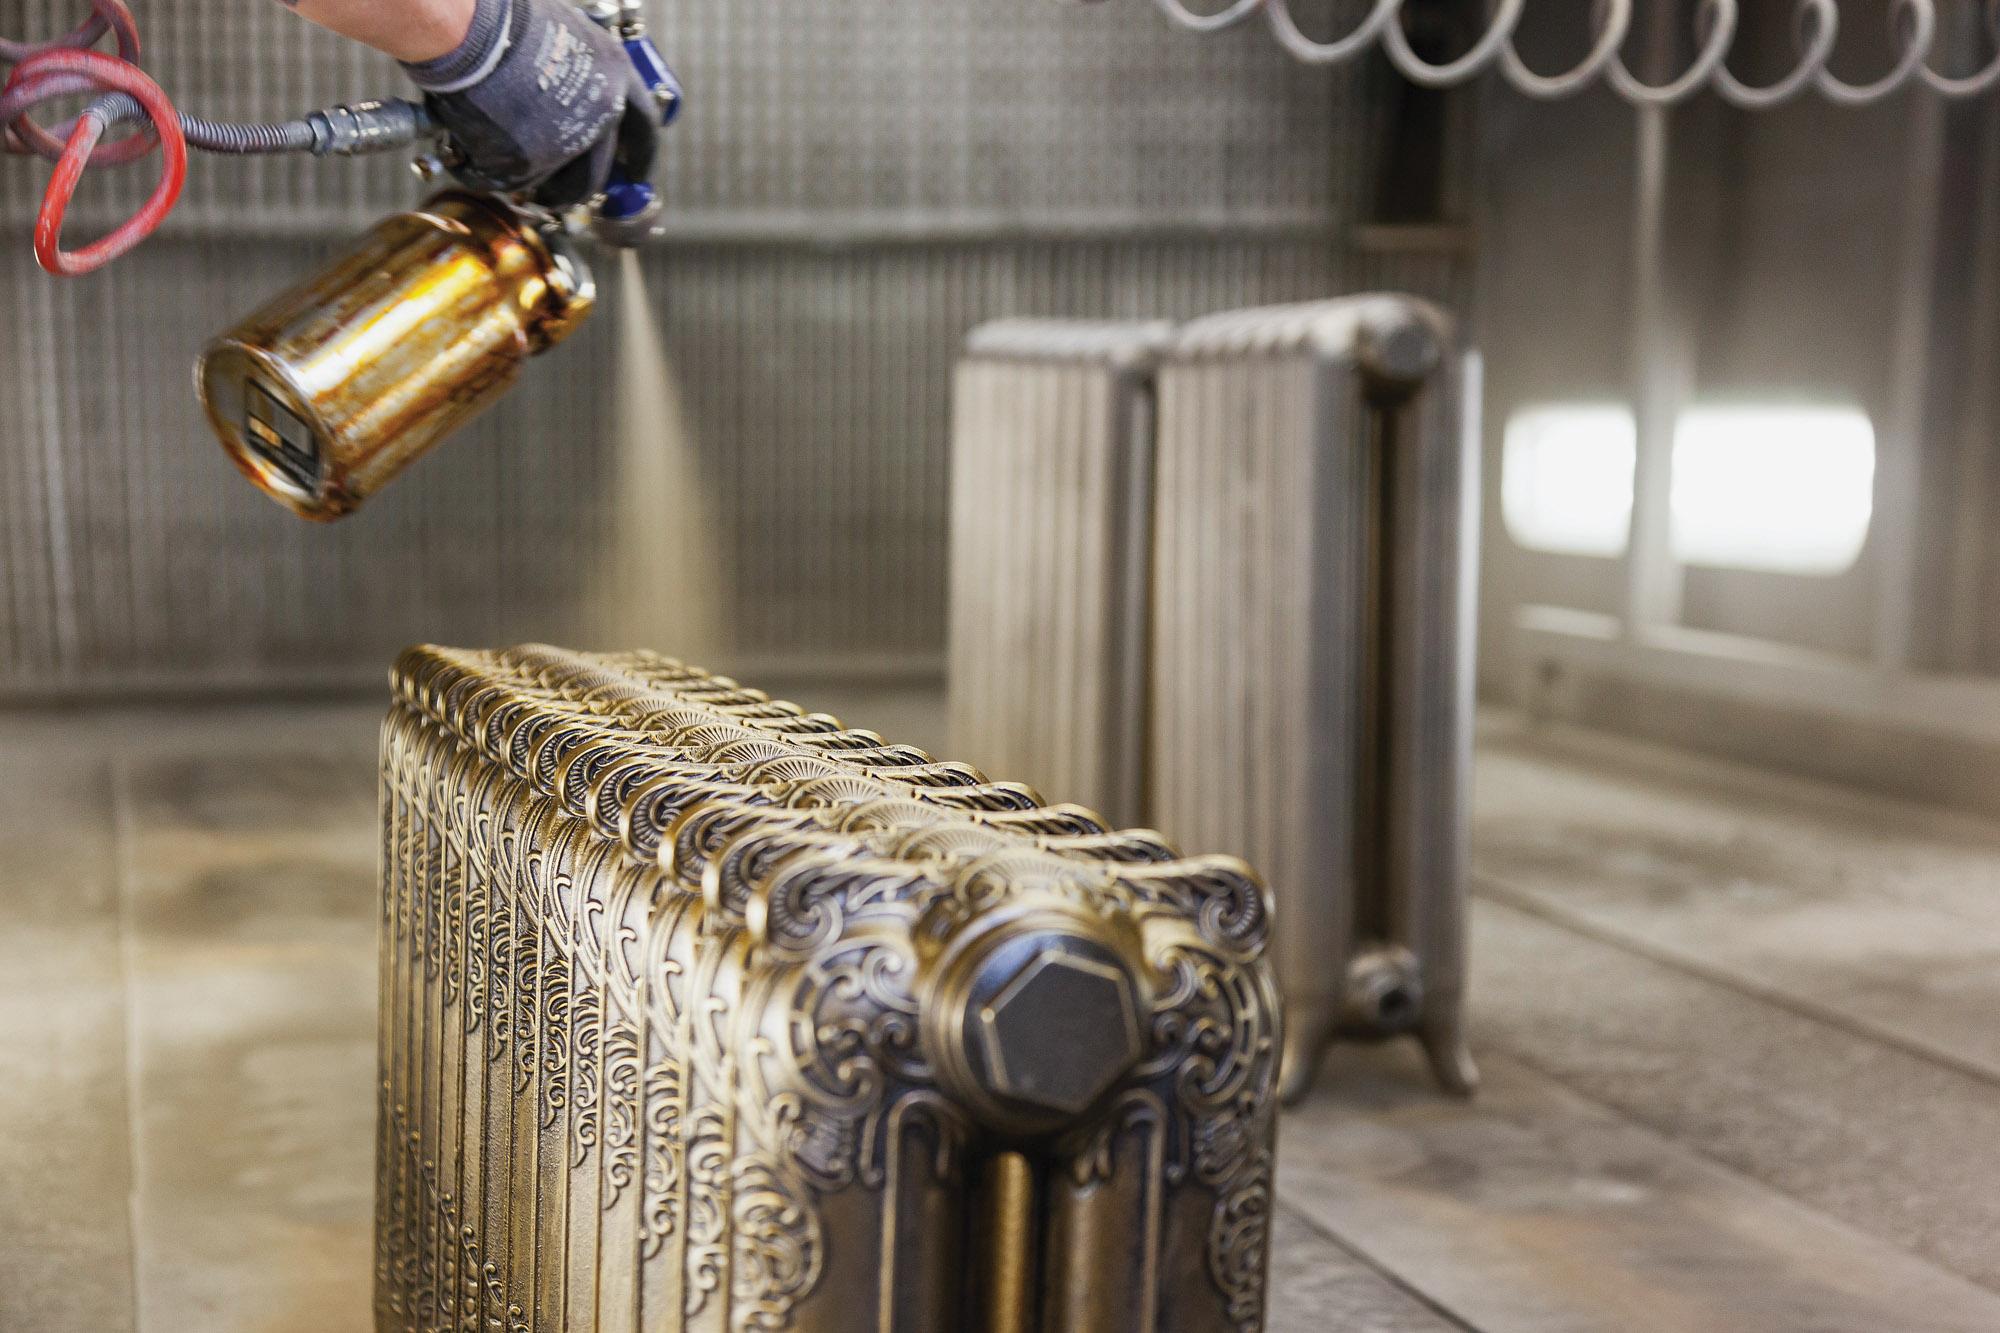 Castrads 'Rococo' radiator gets a hand-sprayed finish